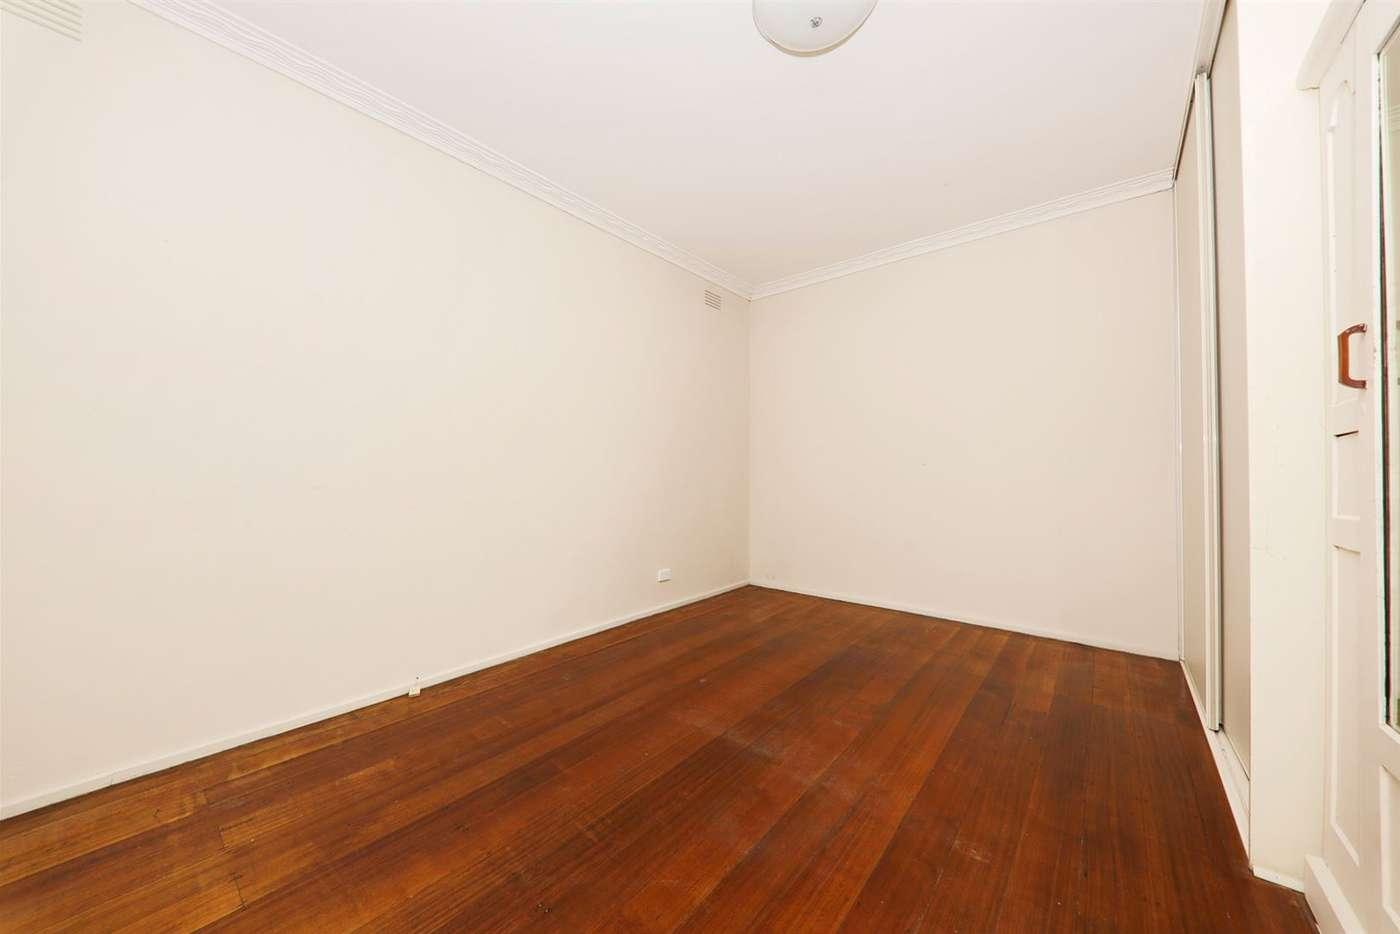 Sixth view of Homely unit listing, 1/5 Kuebler Street, Glen Waverley VIC 3150